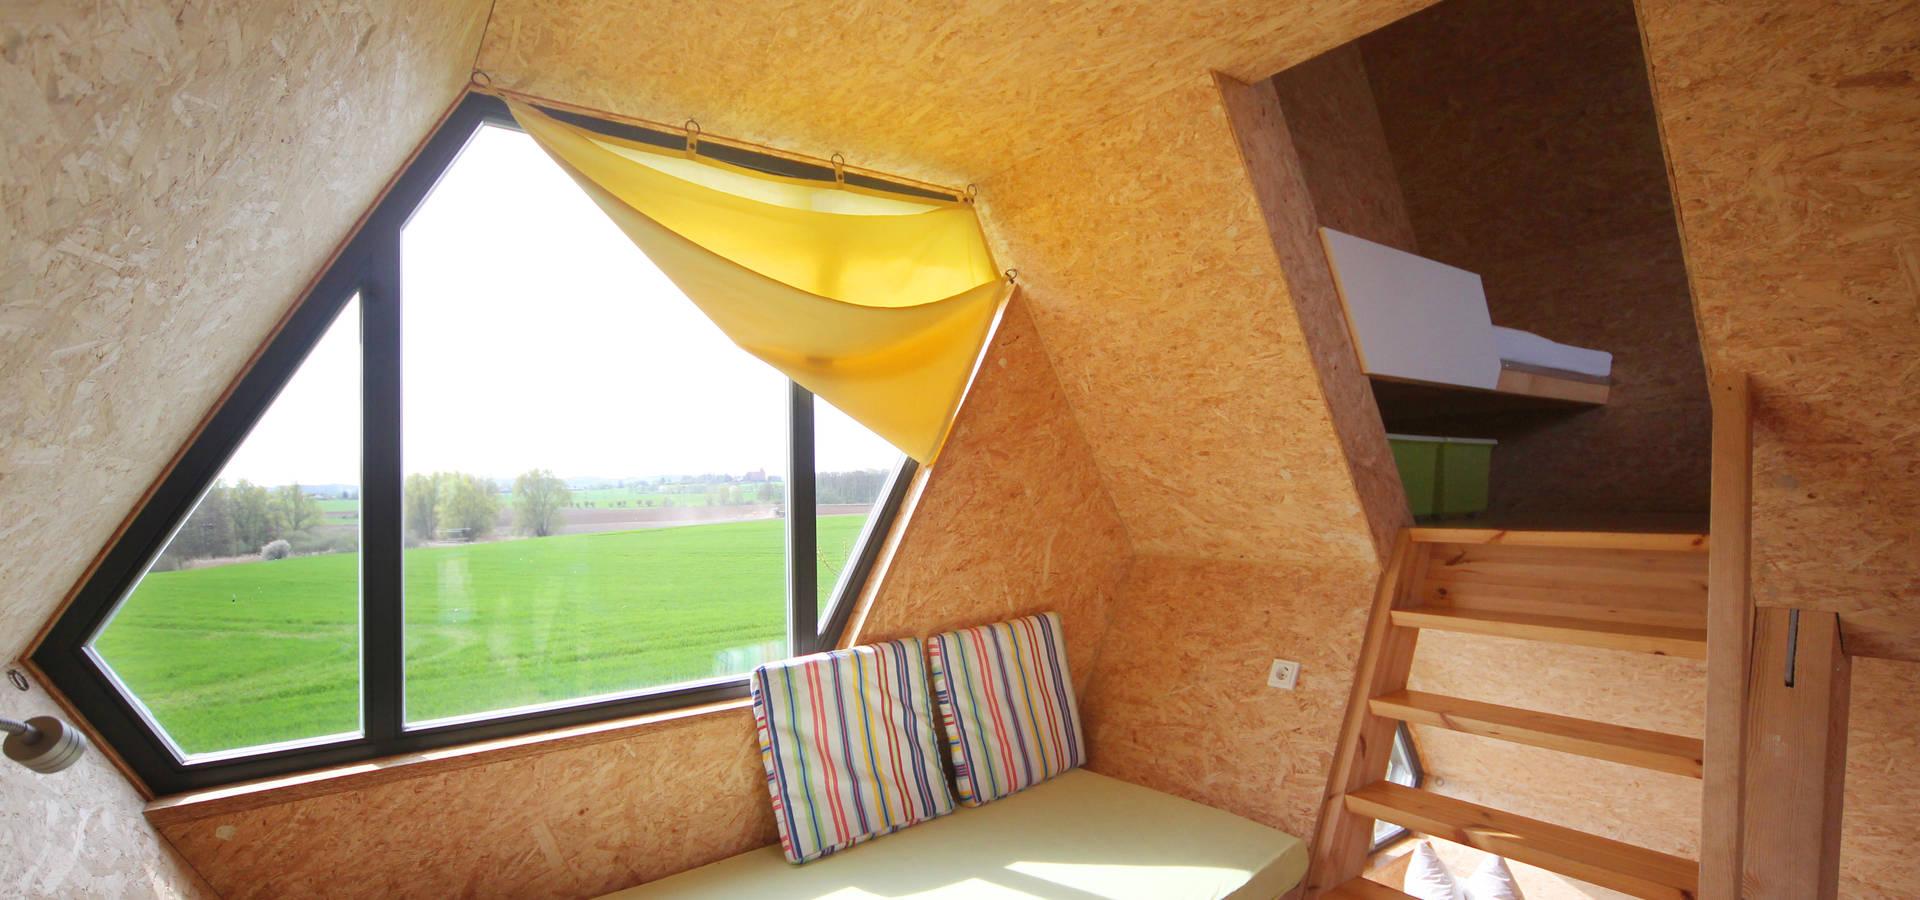 gr ne wiek design baumhausdorf beckerwitz by gr ne wiek. Black Bedroom Furniture Sets. Home Design Ideas